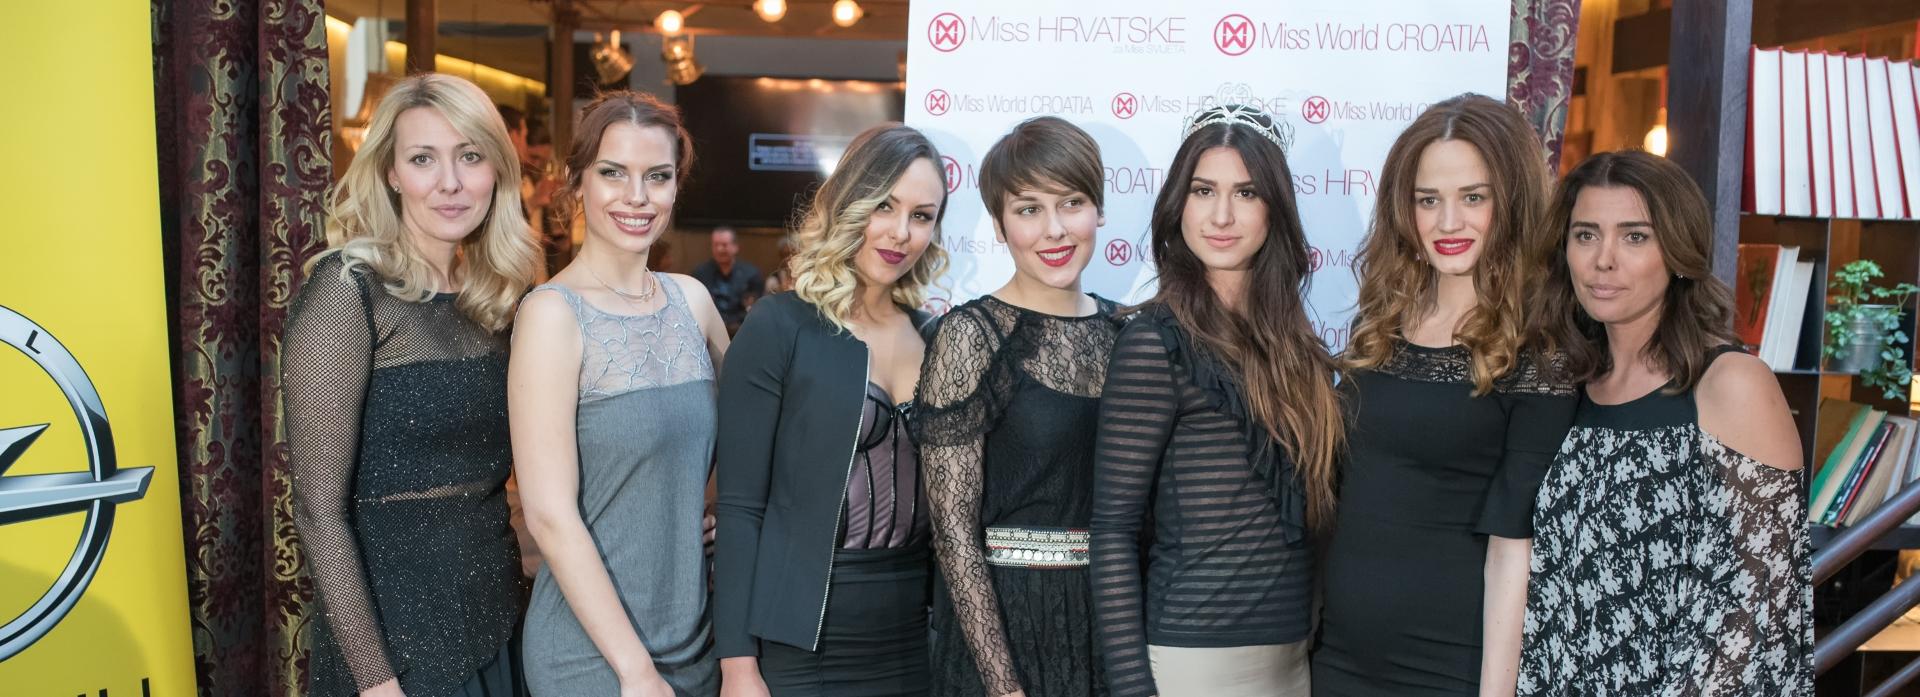 FOTO: Jubilej izbora Miss Hrvatske uz brojne novitete